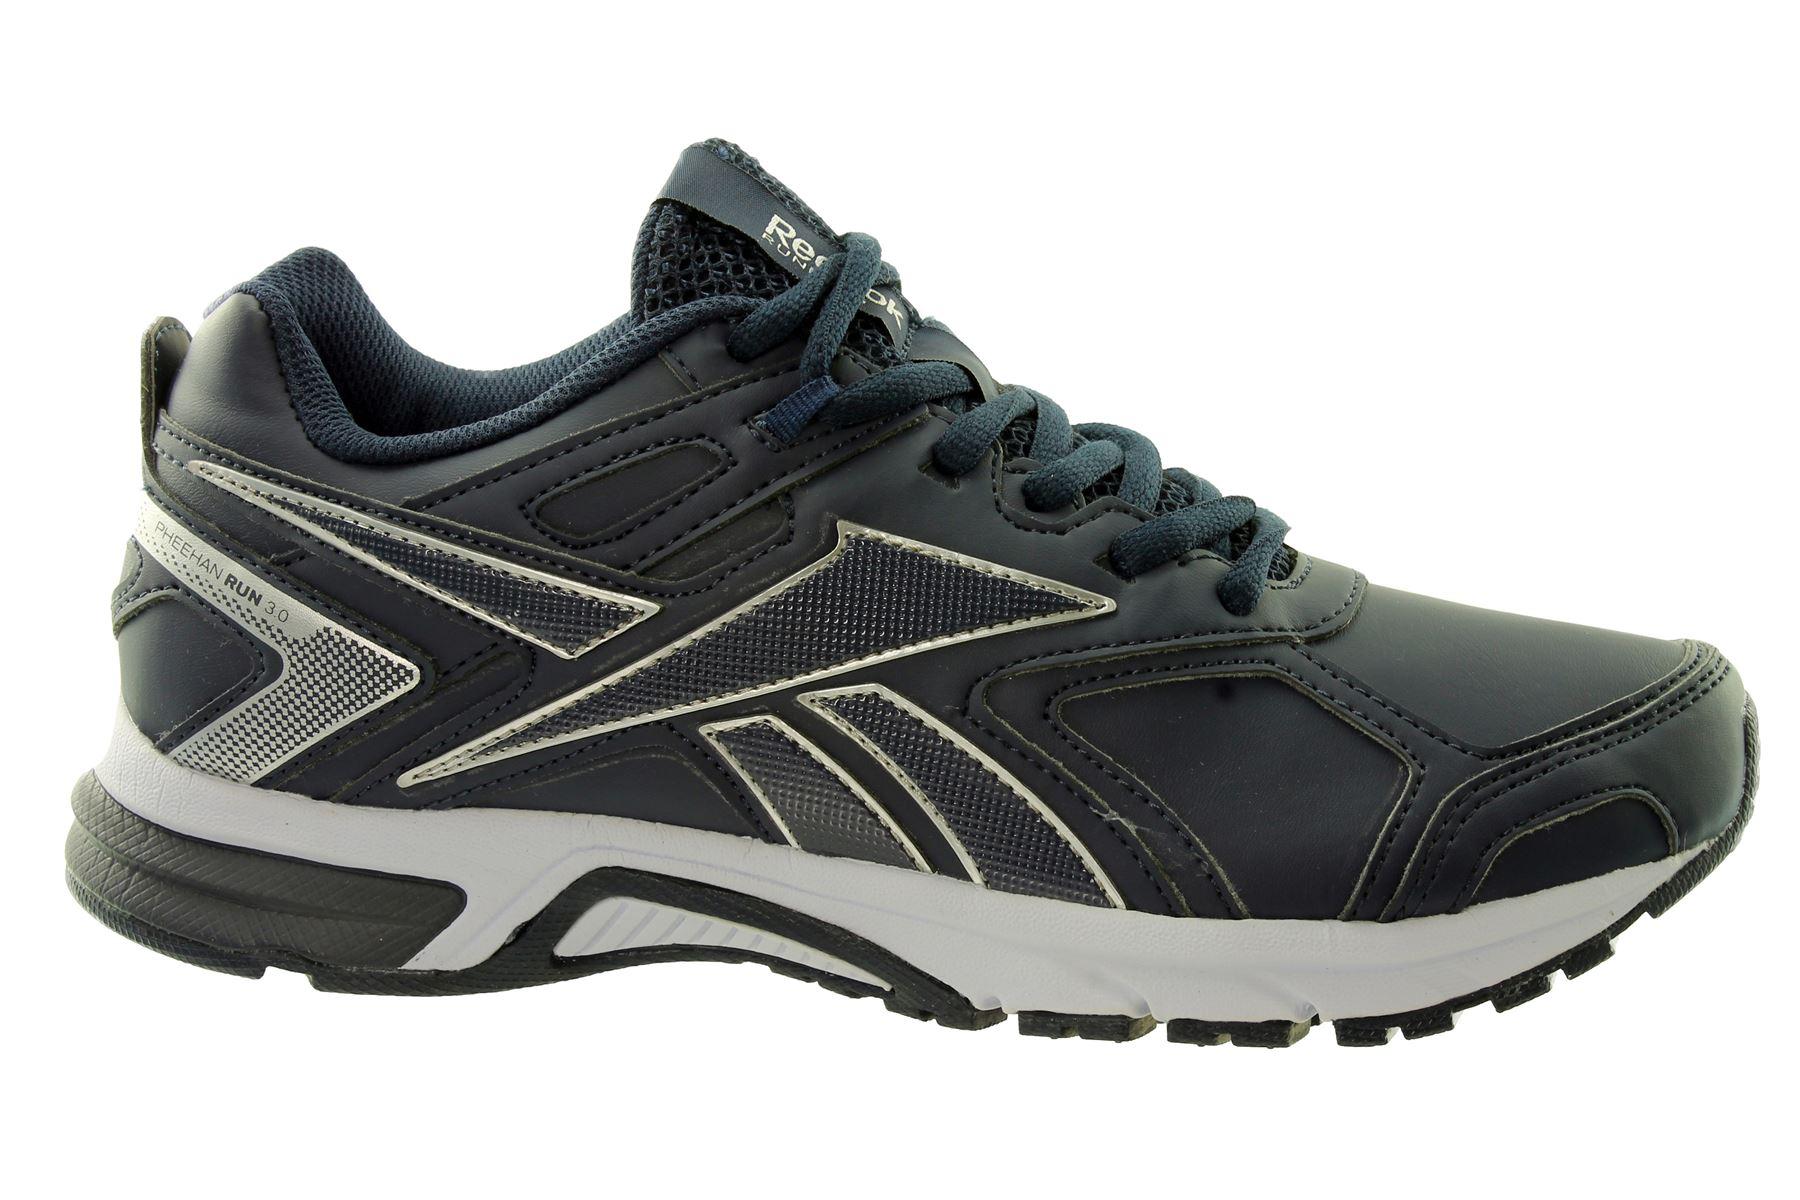 Chaussures Reebok Pheehan Run 3.0 V67507 48A9pyQy93